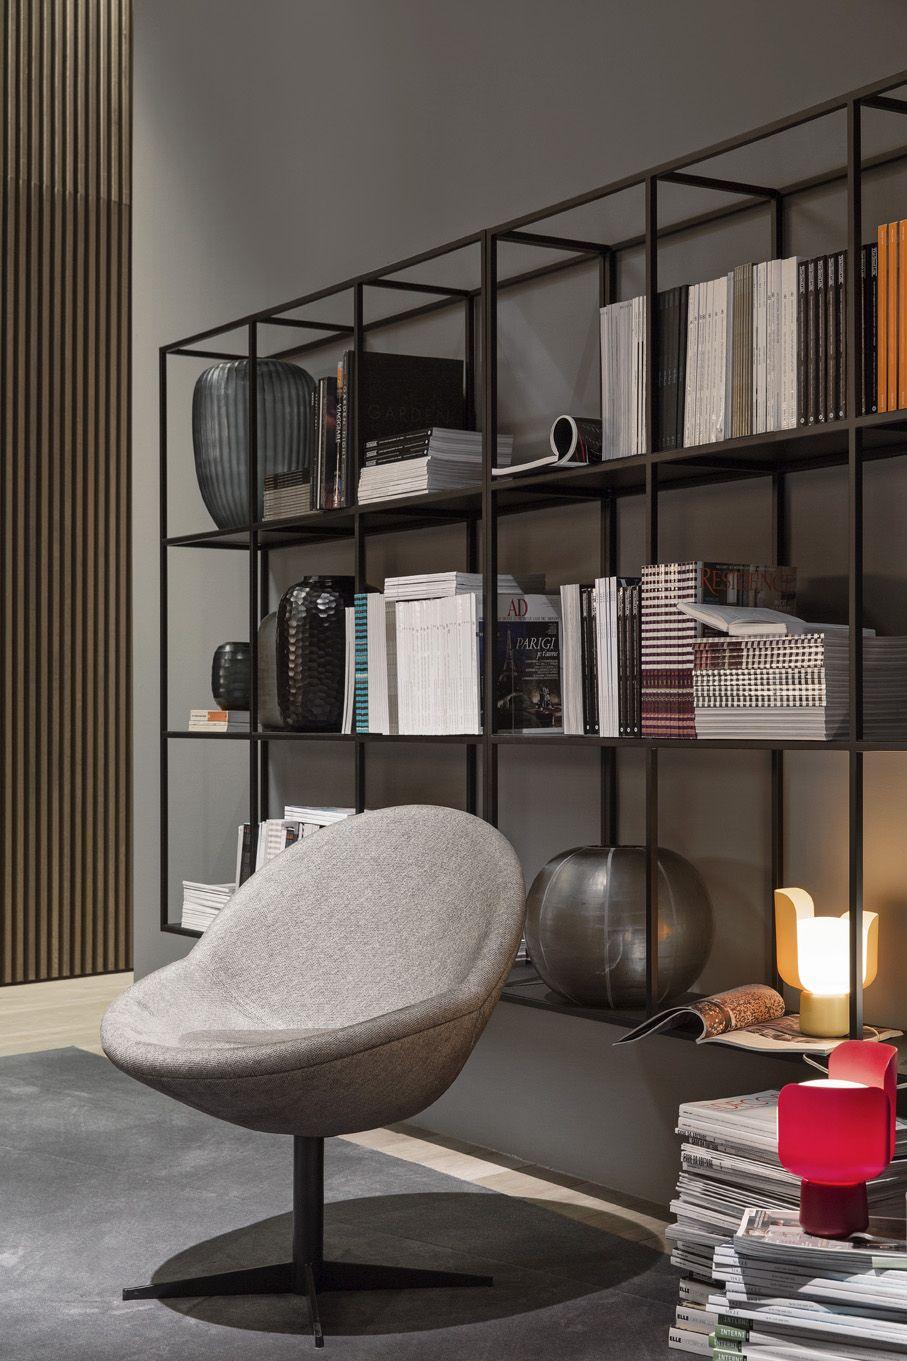 MERIDIANI I Jo armchair I Hardy wall units - design Andrea Parisio ...